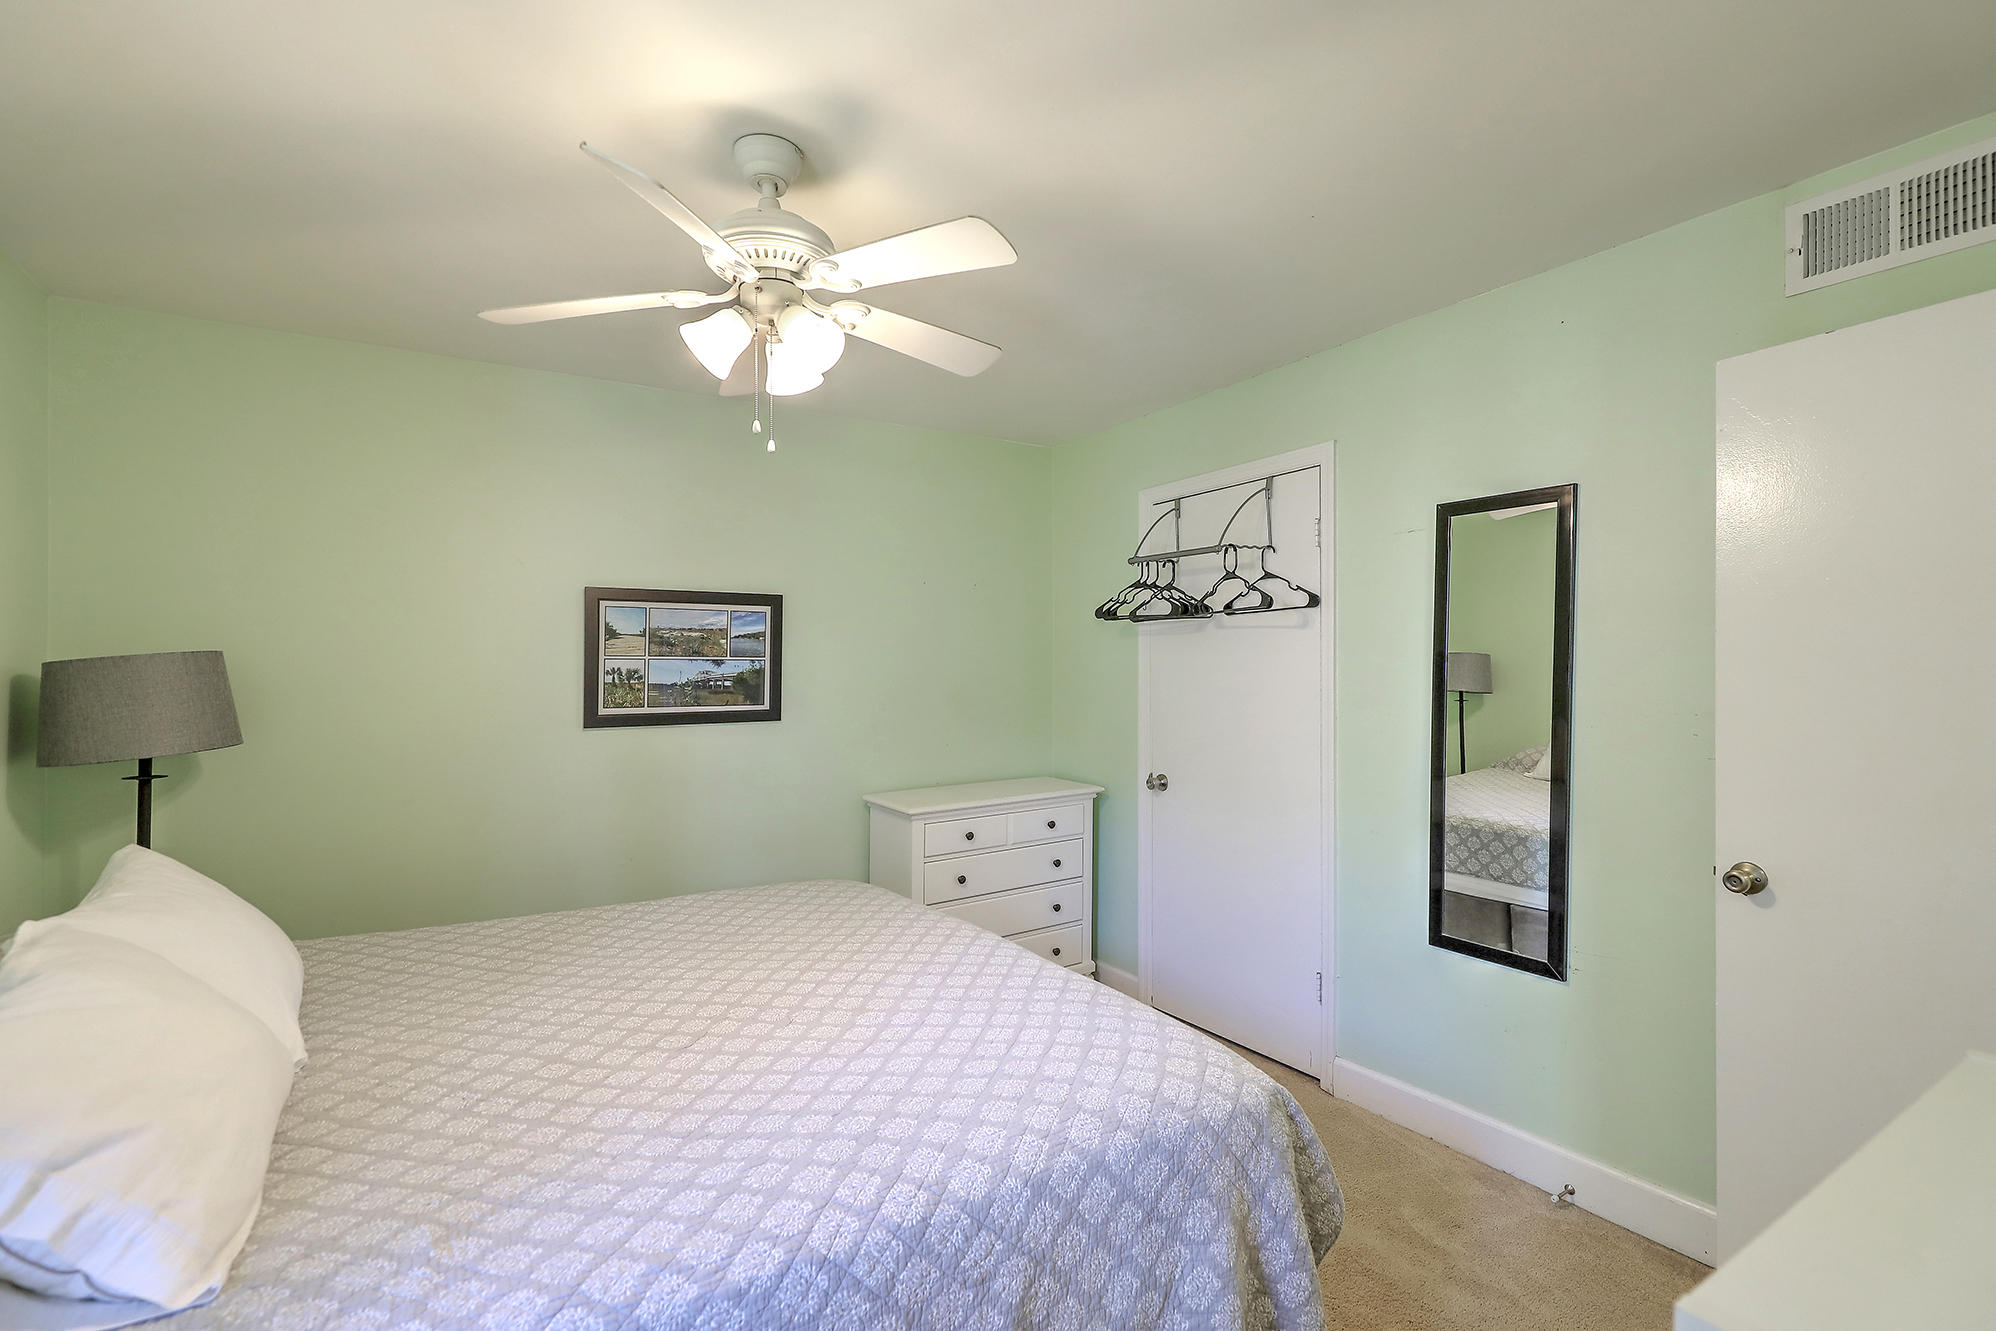 Marsh Grass Condominiums Homes For Sale - 1501 Ben Sawyer, Mount Pleasant, SC - 9